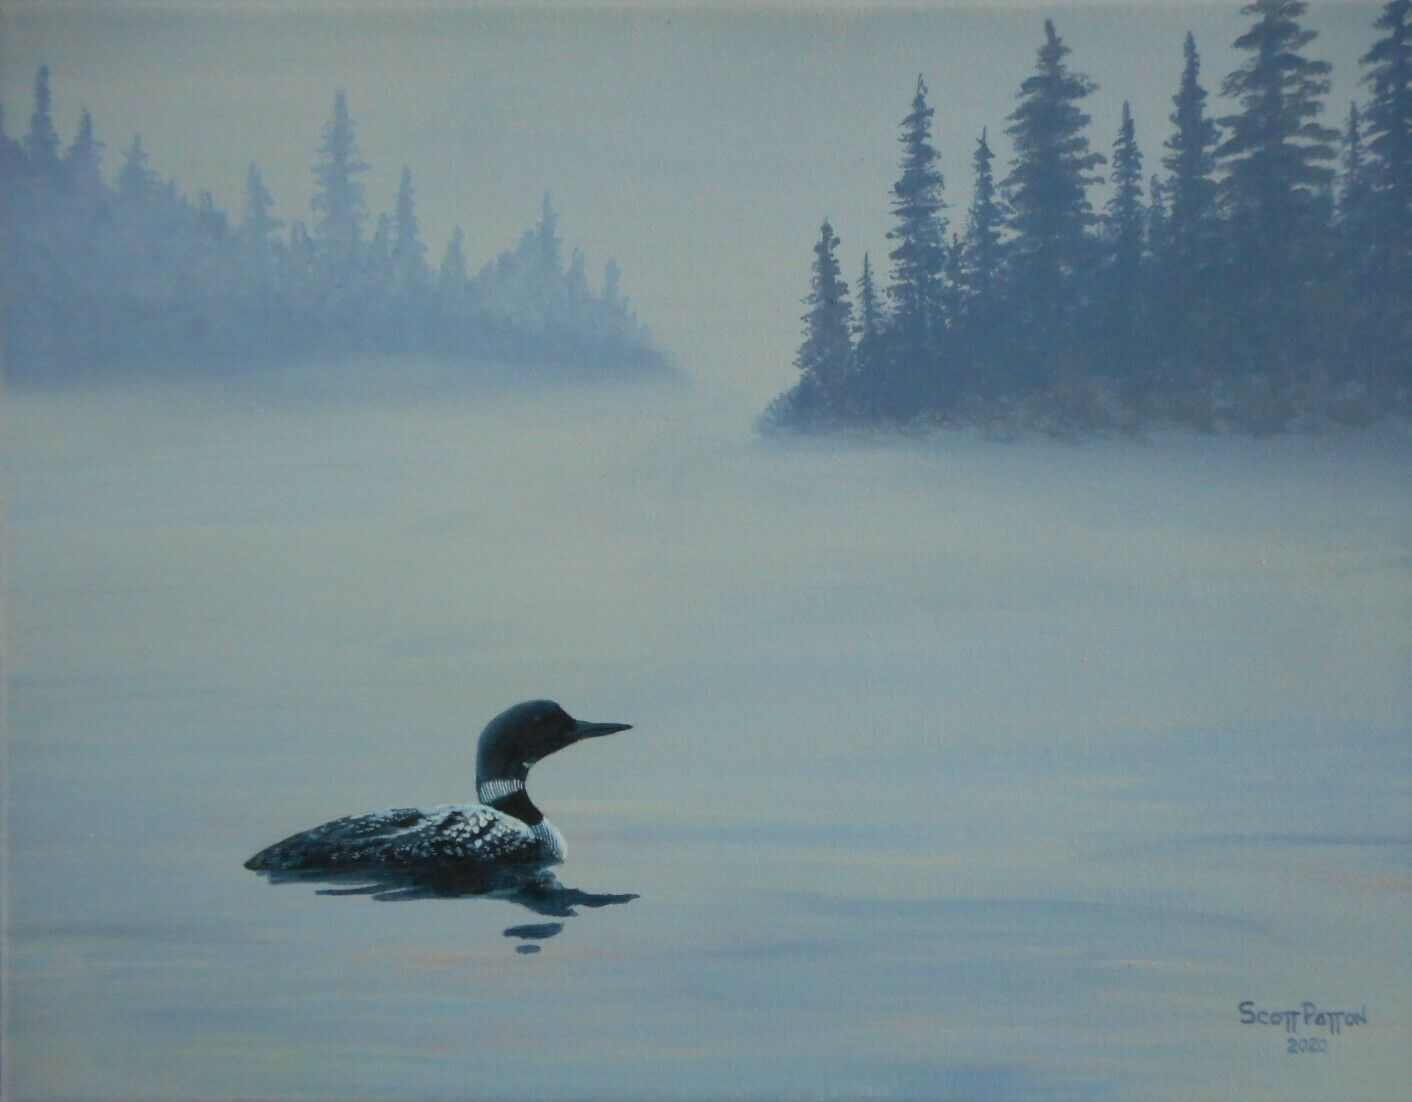 Scott Patton Art Loon On Foggy Lake Original North Woods Wildlife Painting - $80.00